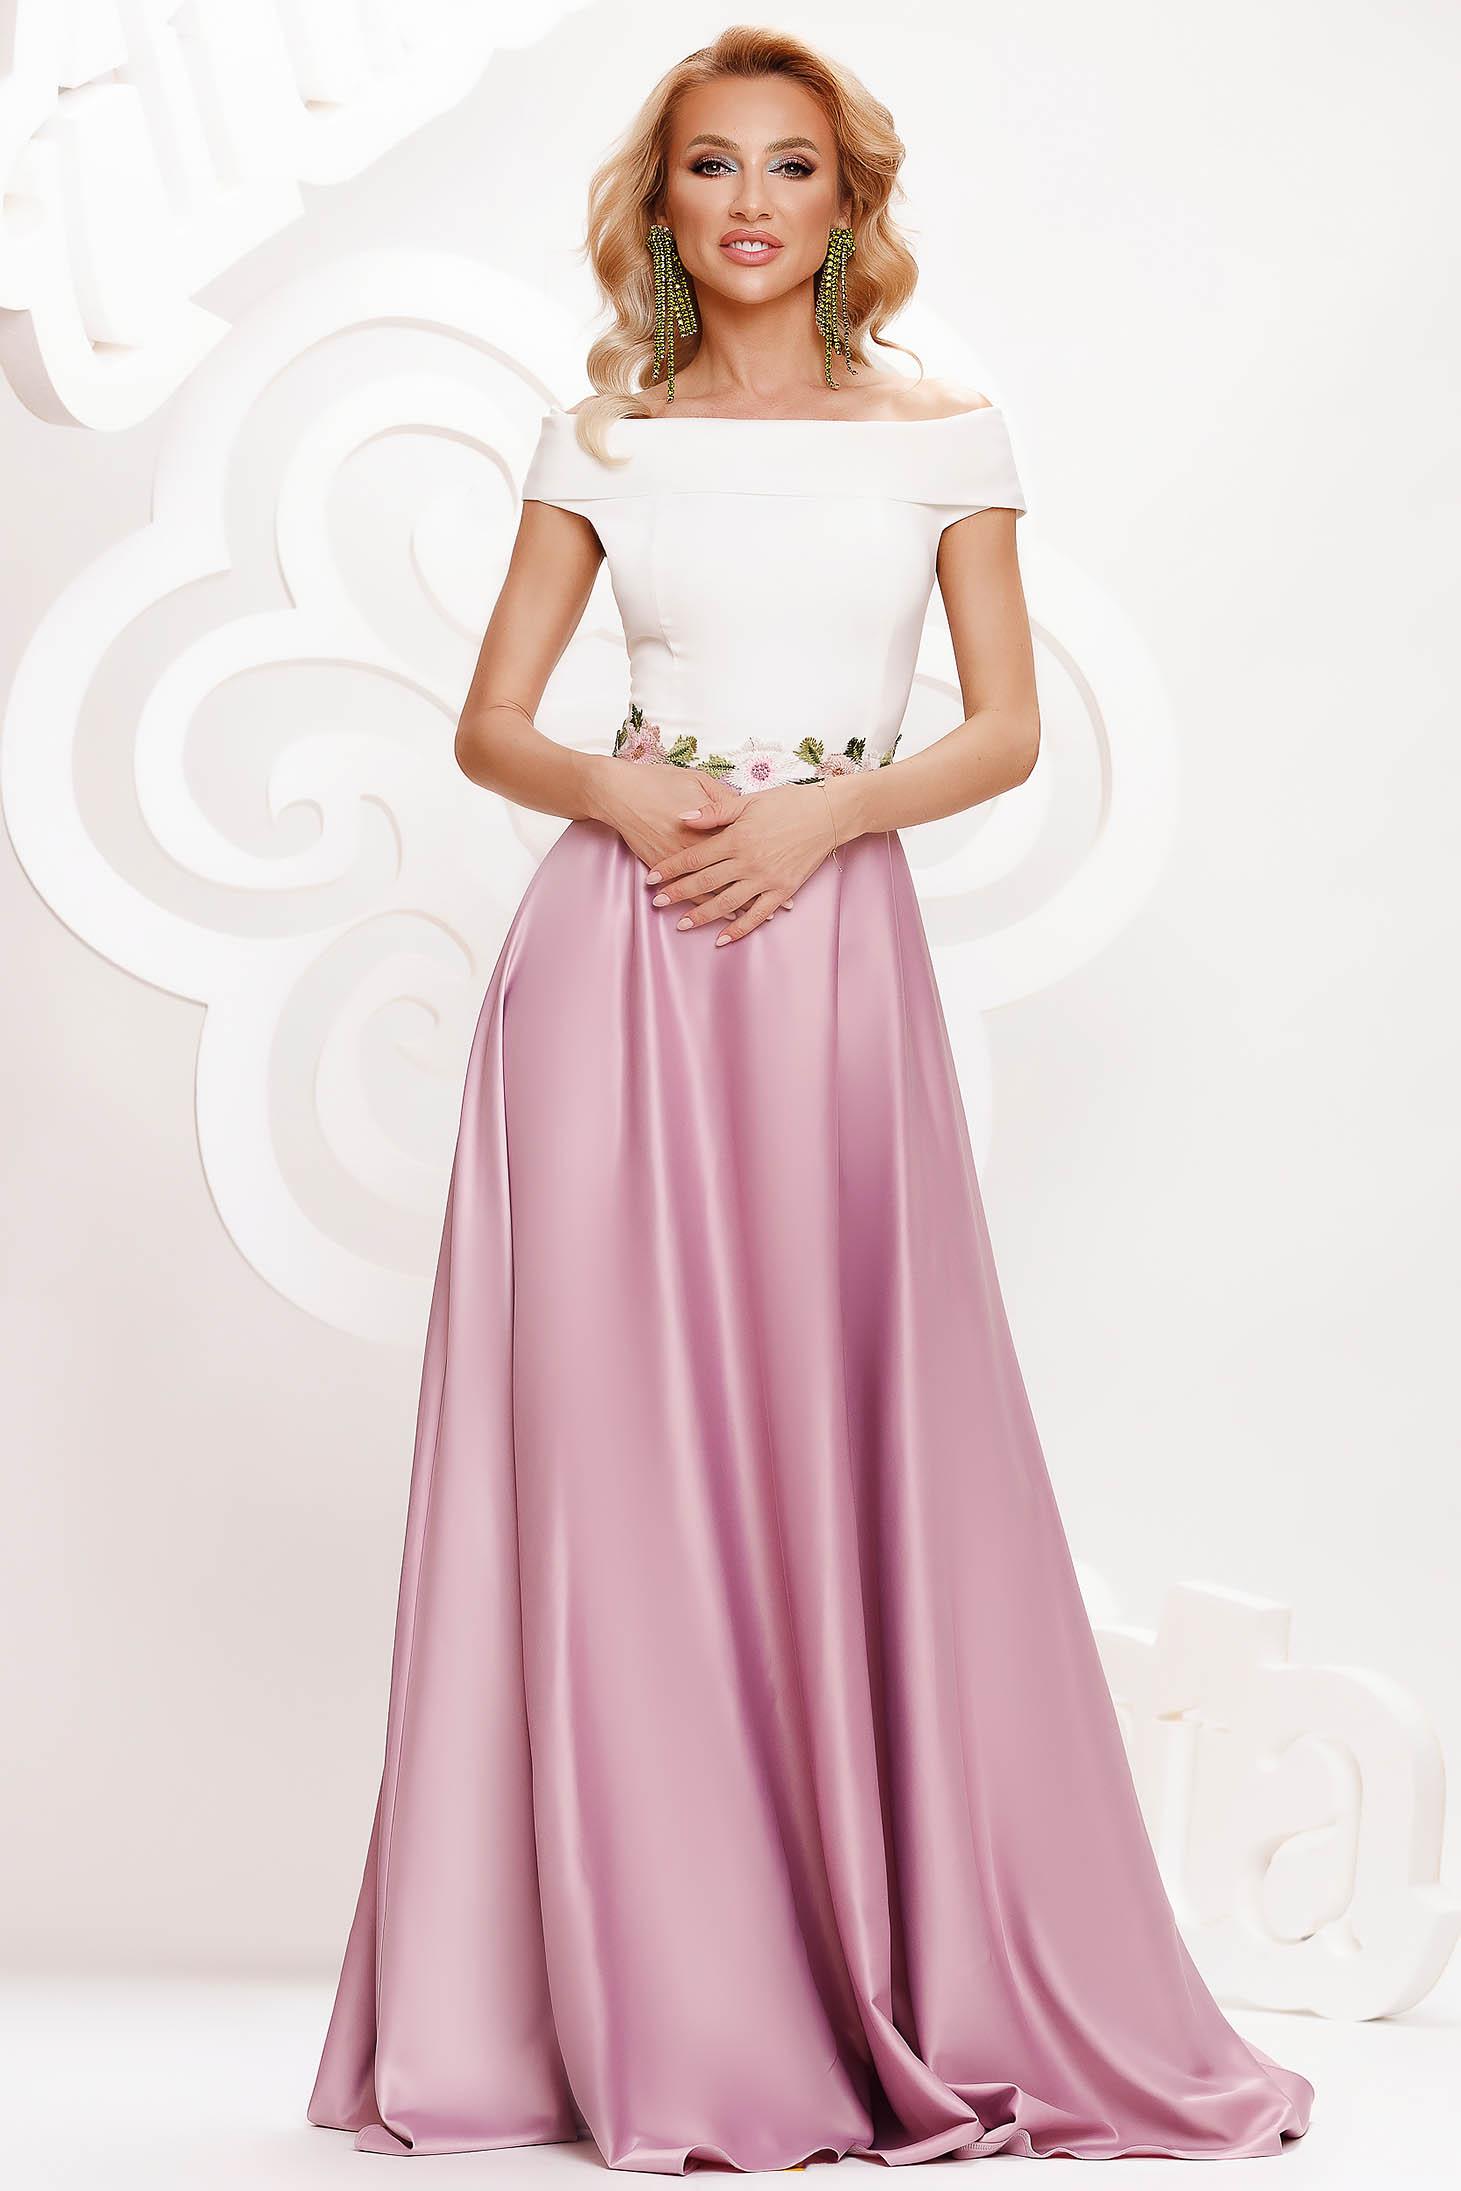 Rochie roz deschis de ocazie in clos din material satinat cu insertii de broderie